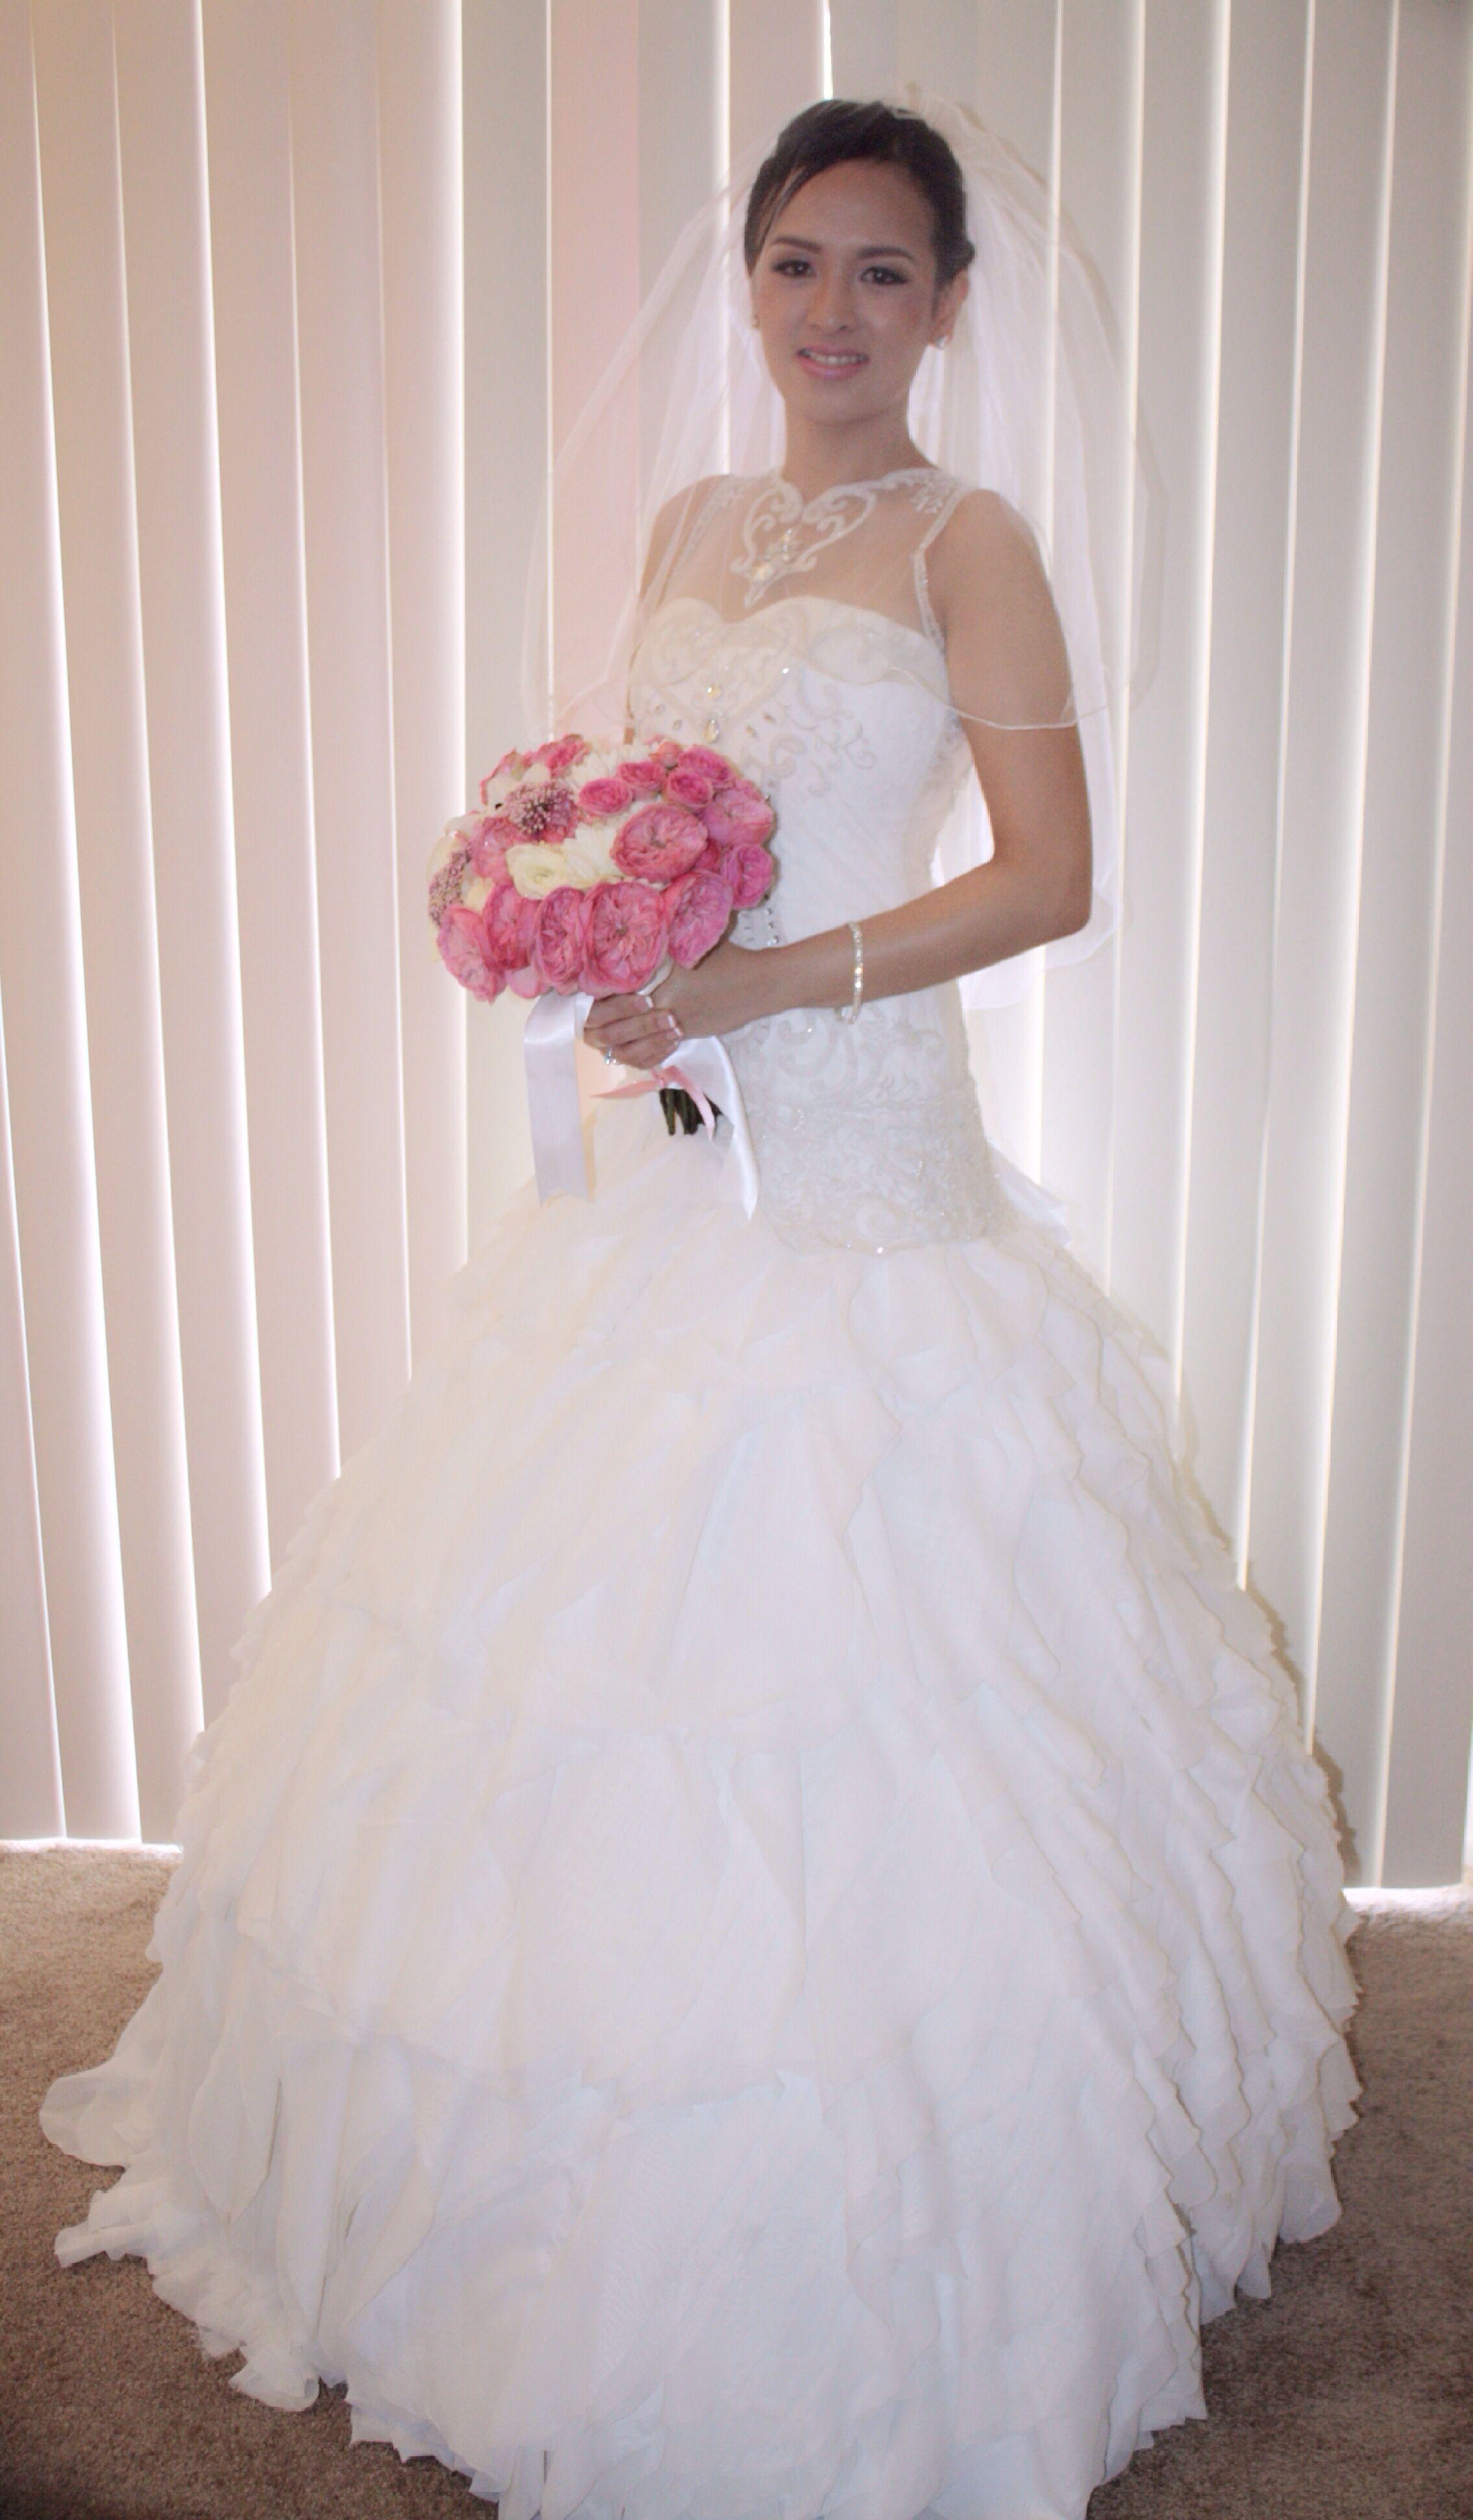 Wedding dress customized by kat padilla atelier see her in facebook wedding dress customized by kat padilla atelier see her in facebook junglespirit Images